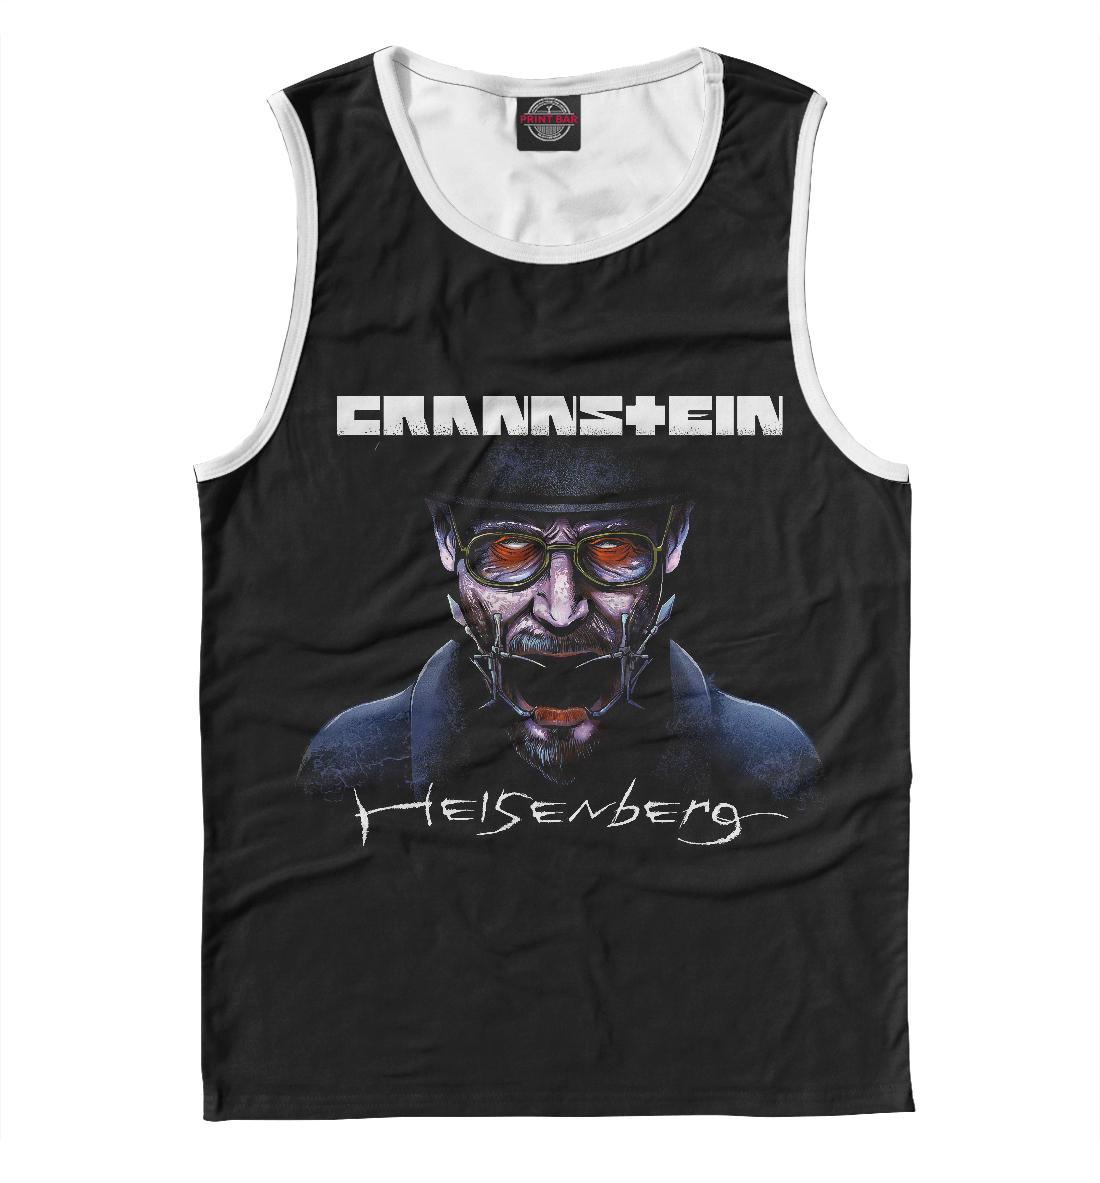 Купить Пародия на группу Rammstein, Printbar, Майки, VVT-738766-may-2